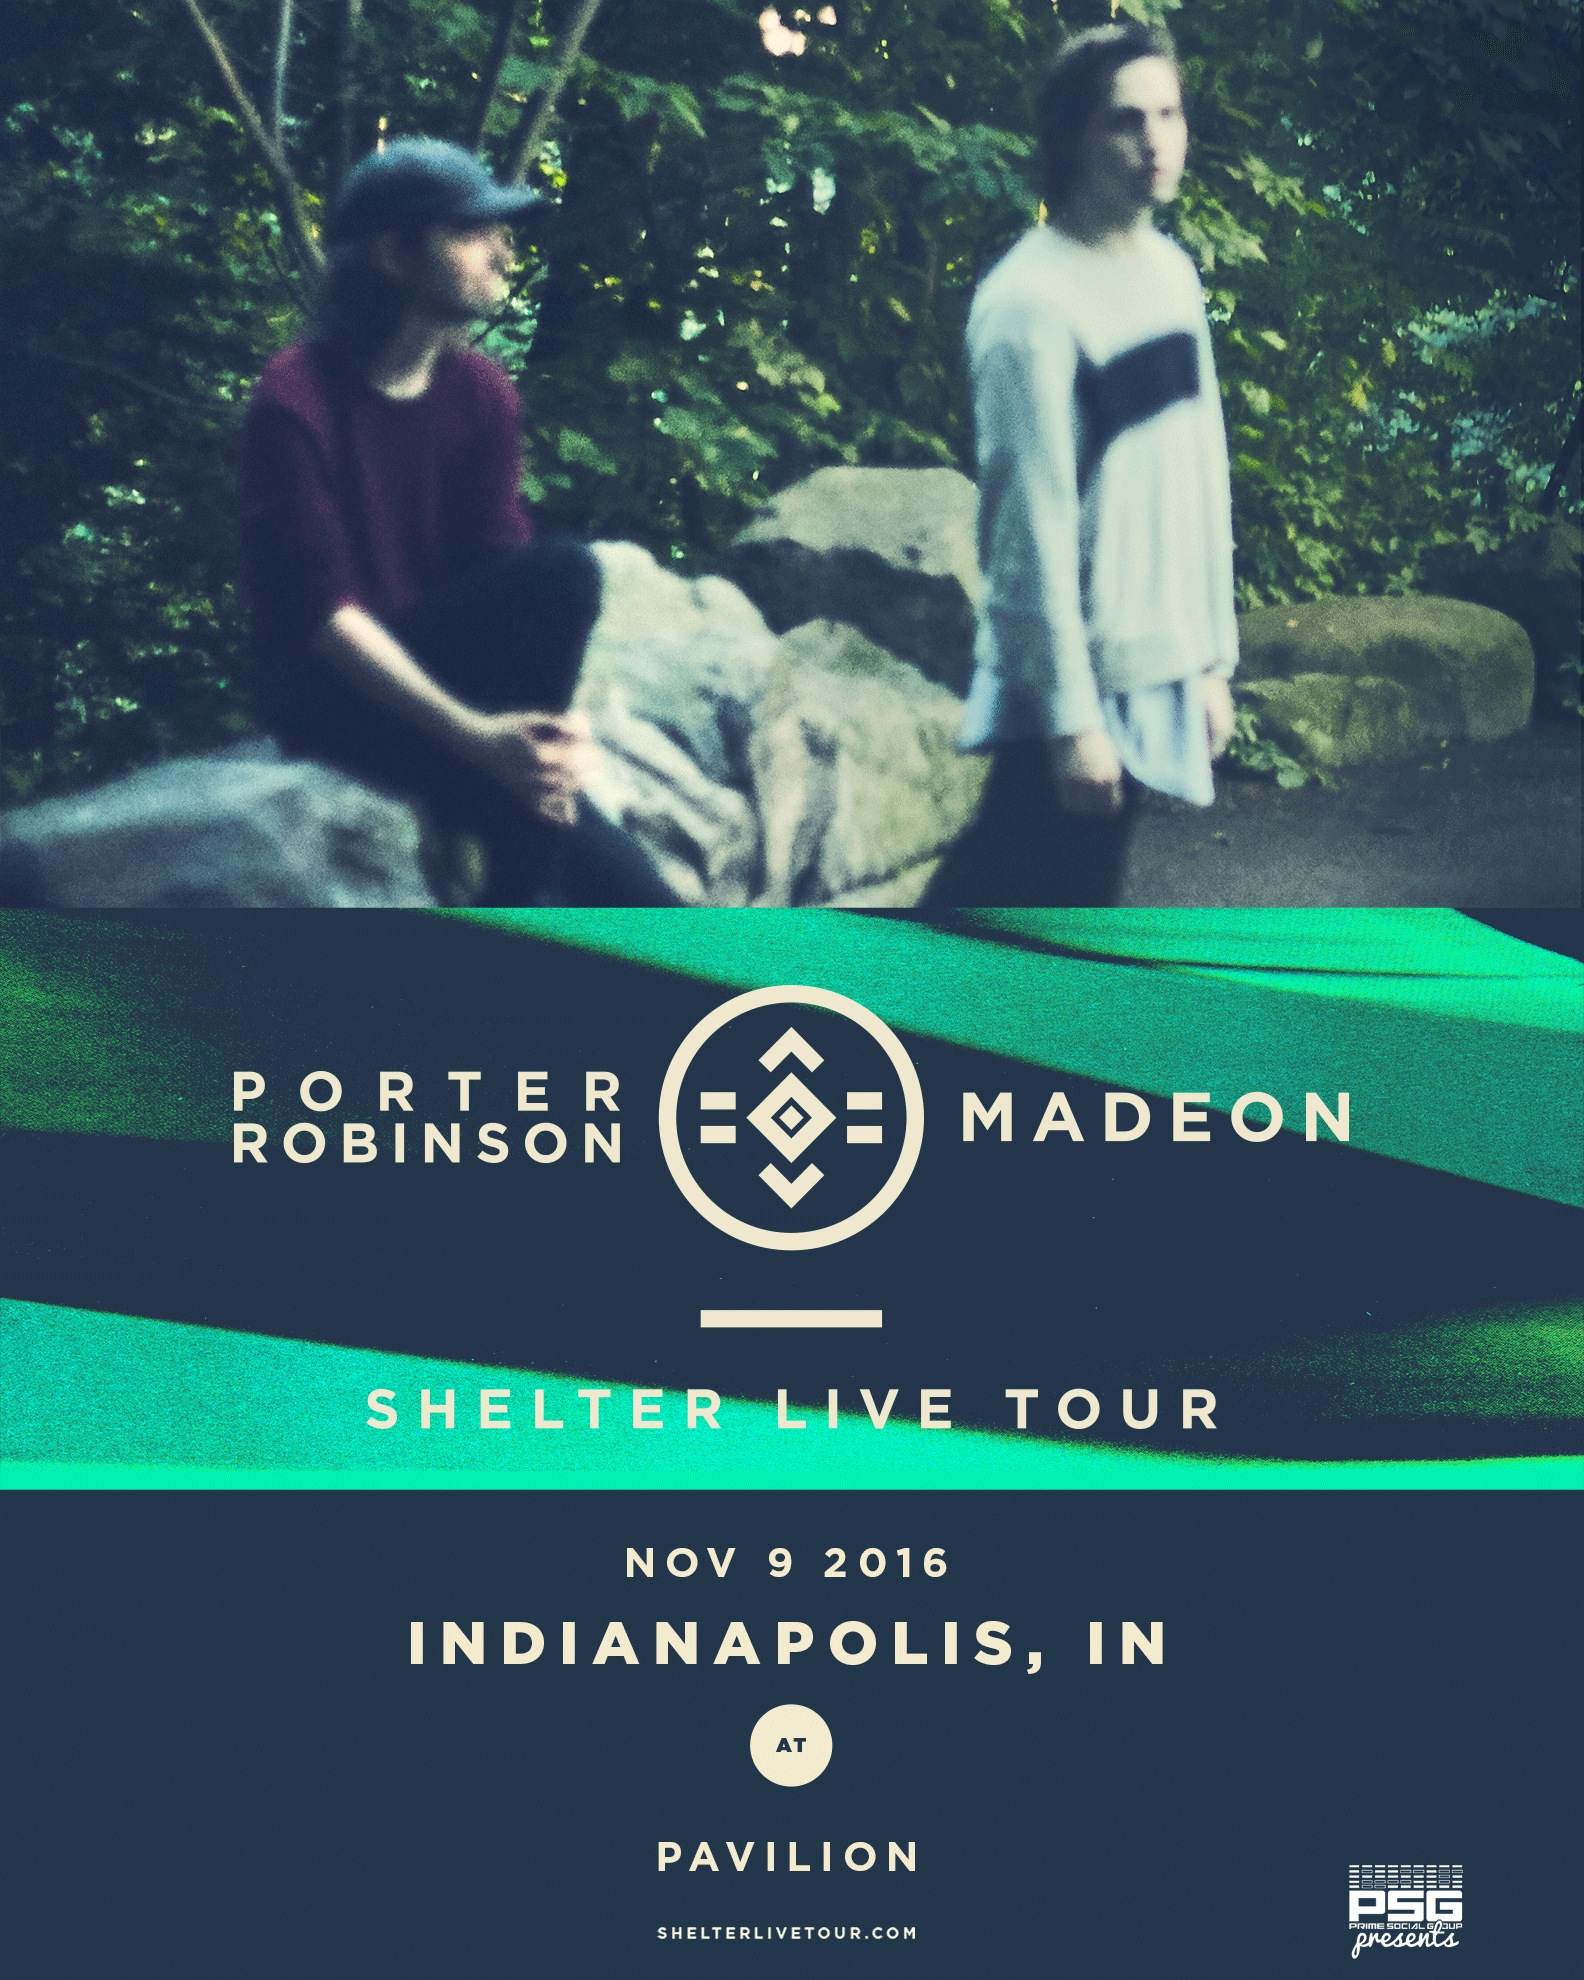 portermadeon. SHELTER LIVE TOUR: Porter Robinson & Madeon